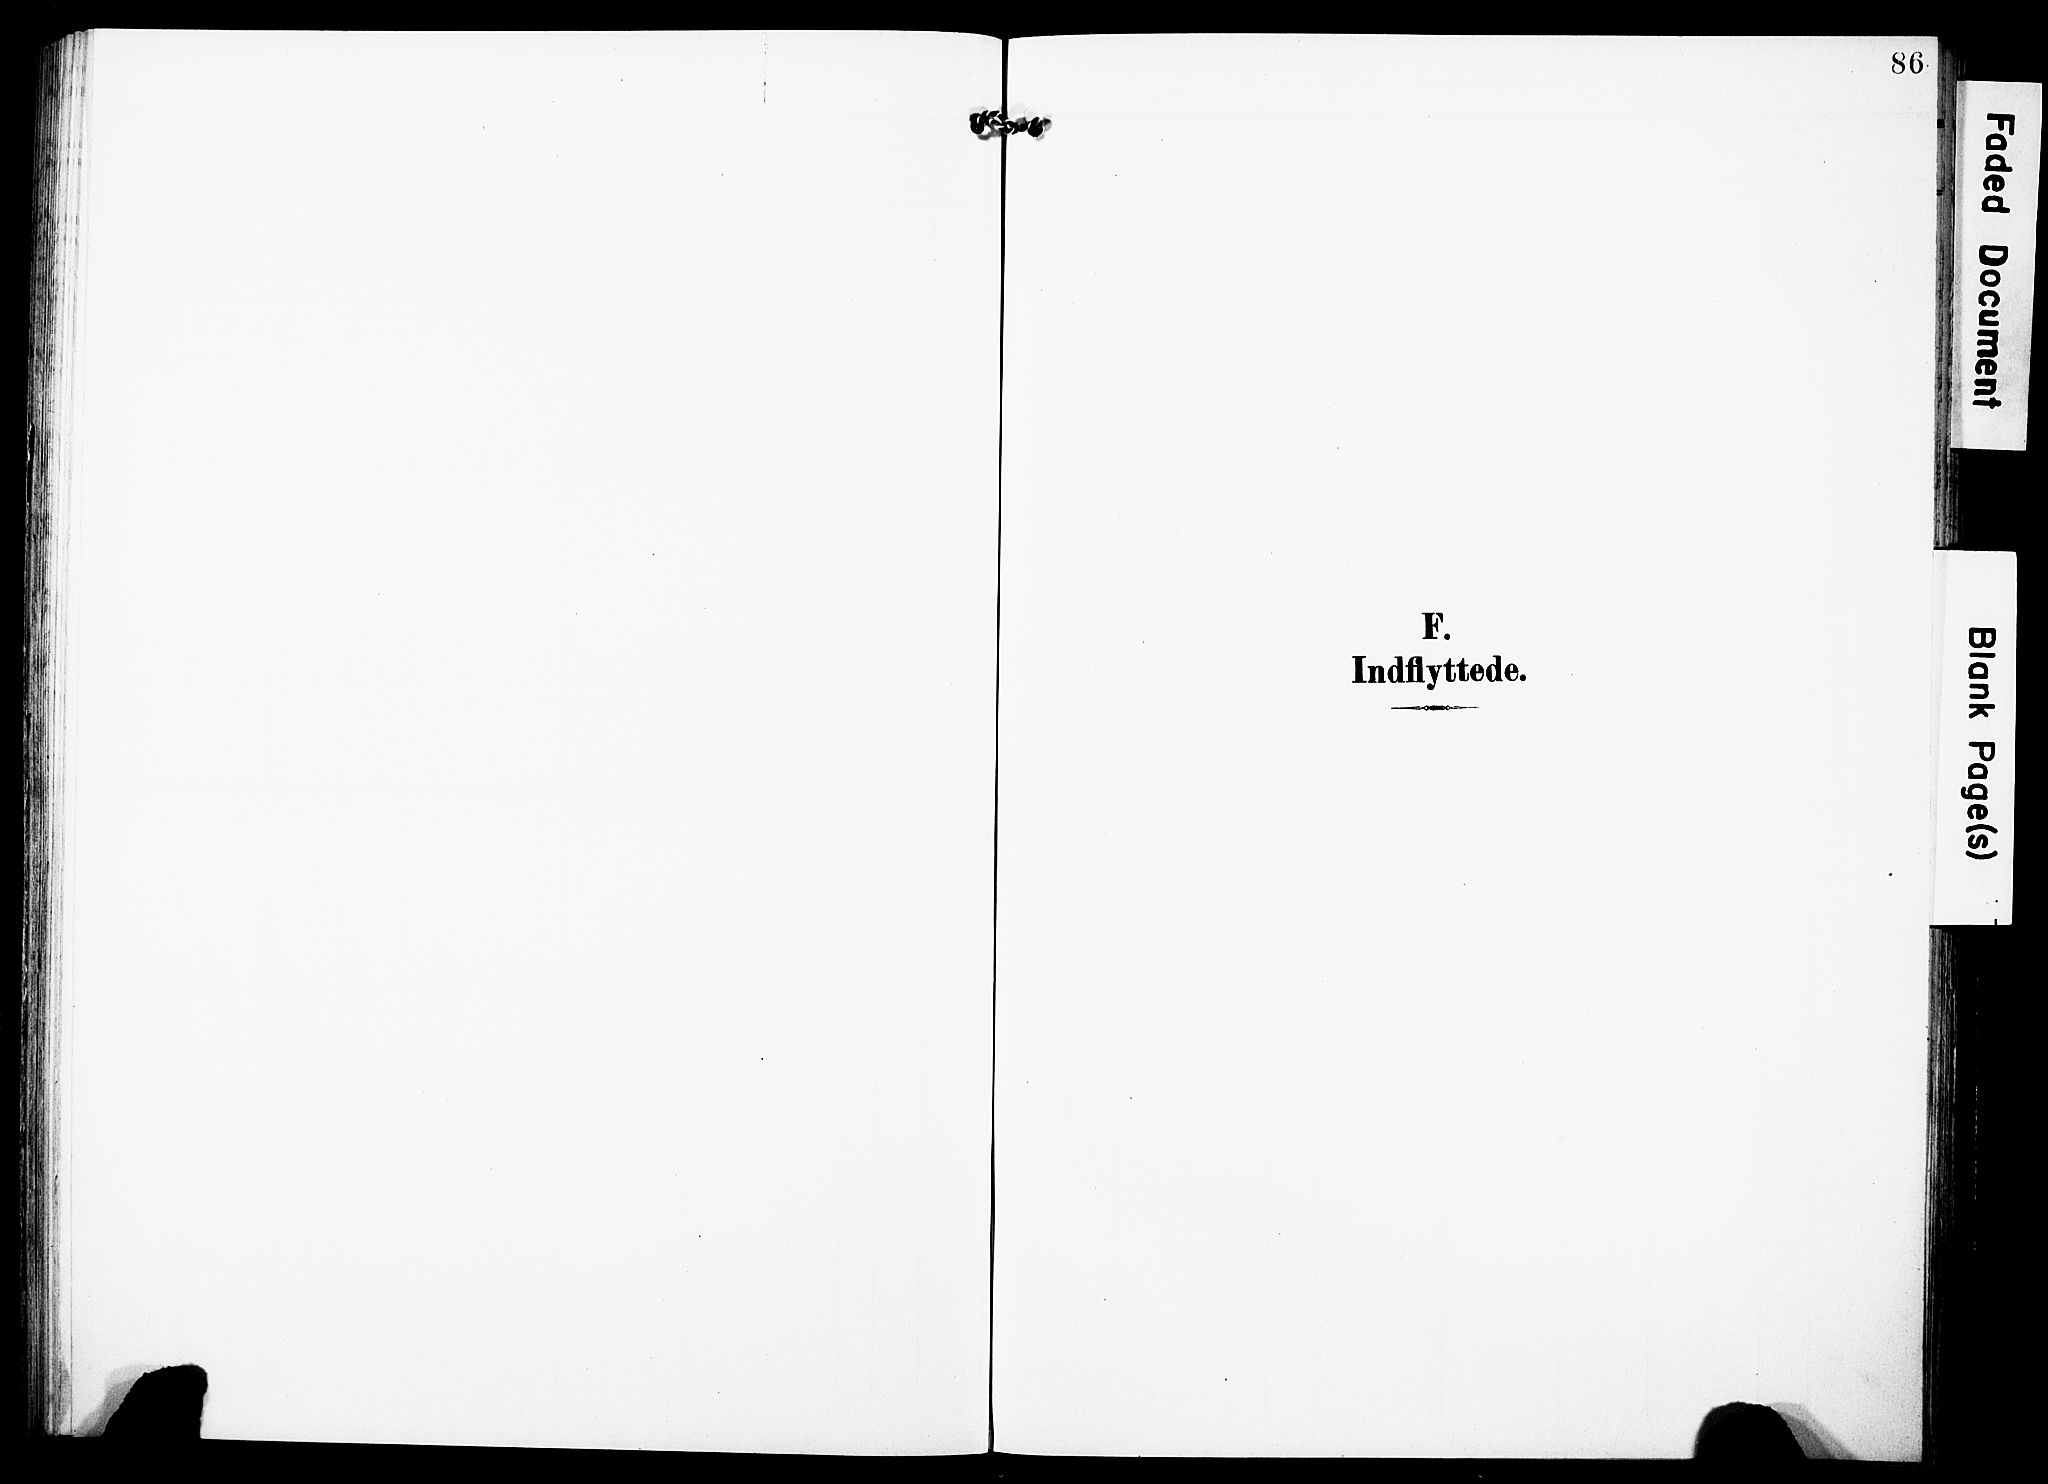 SAST, Torvastad sokneprestkontor, H/Ha/Haa/L0018: Ministerialbok nr. A 17, 1903-1925, s. 86